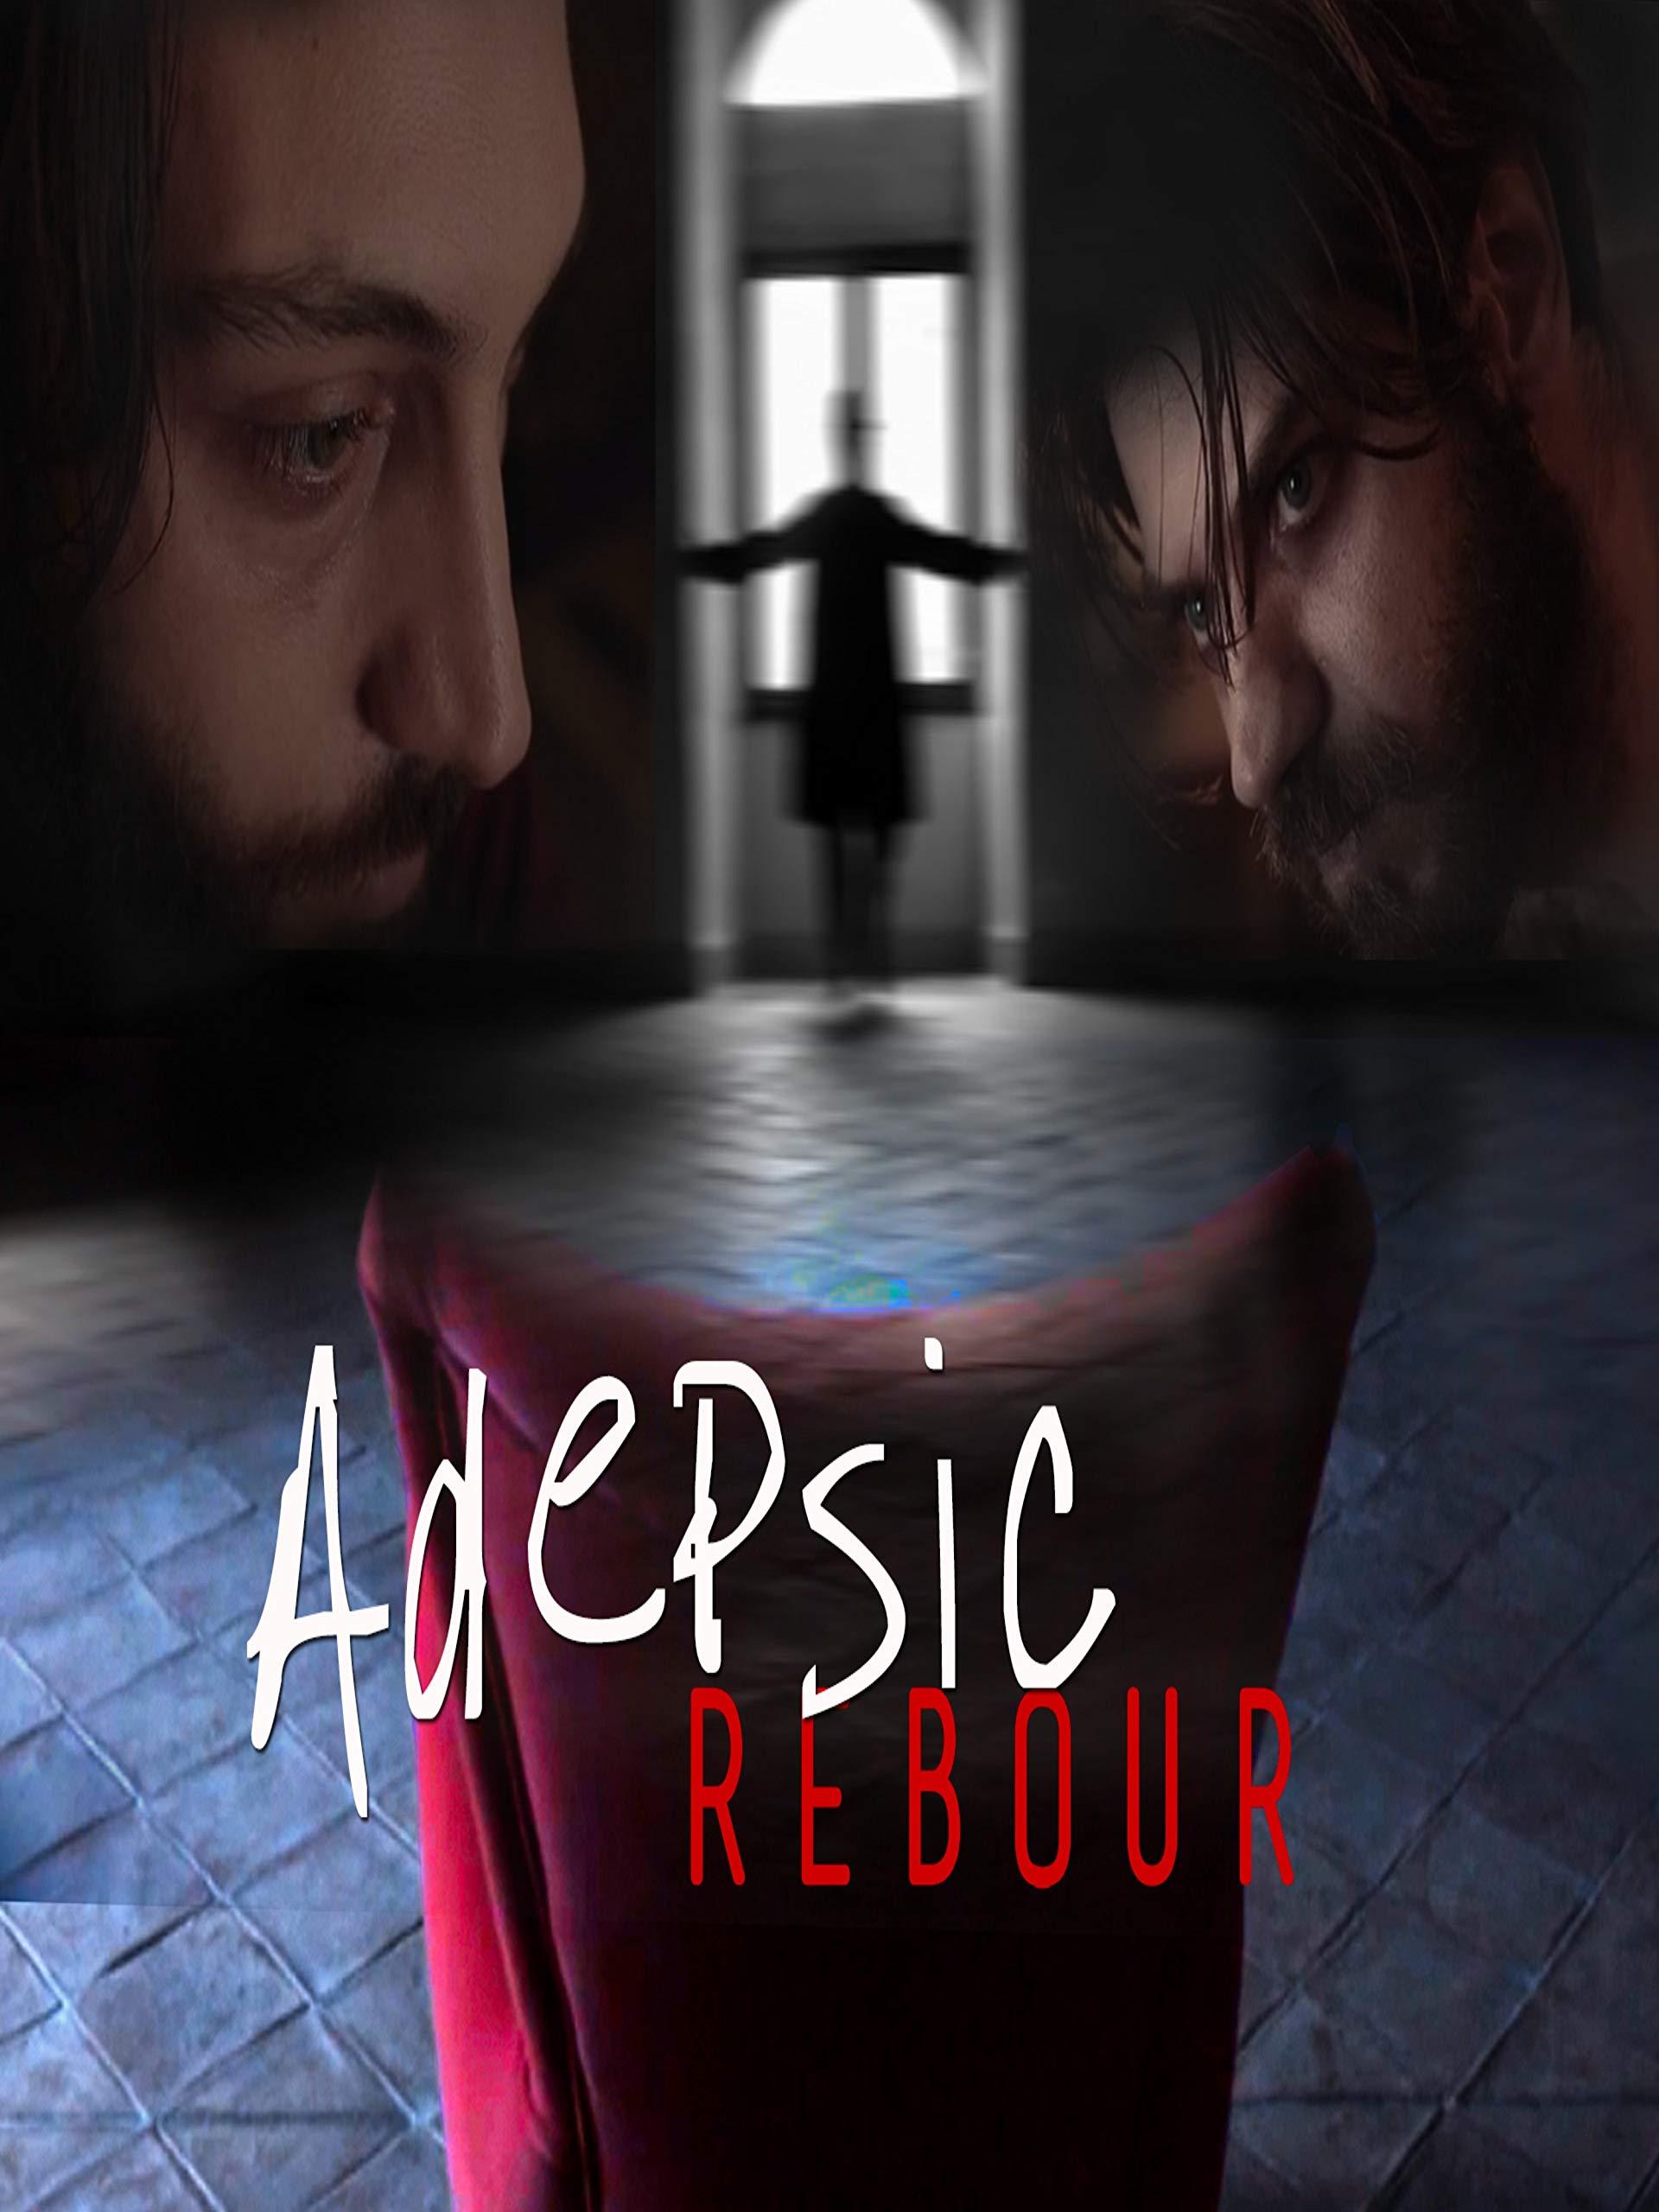 Adepsic Rebours on Amazon Prime Video UK